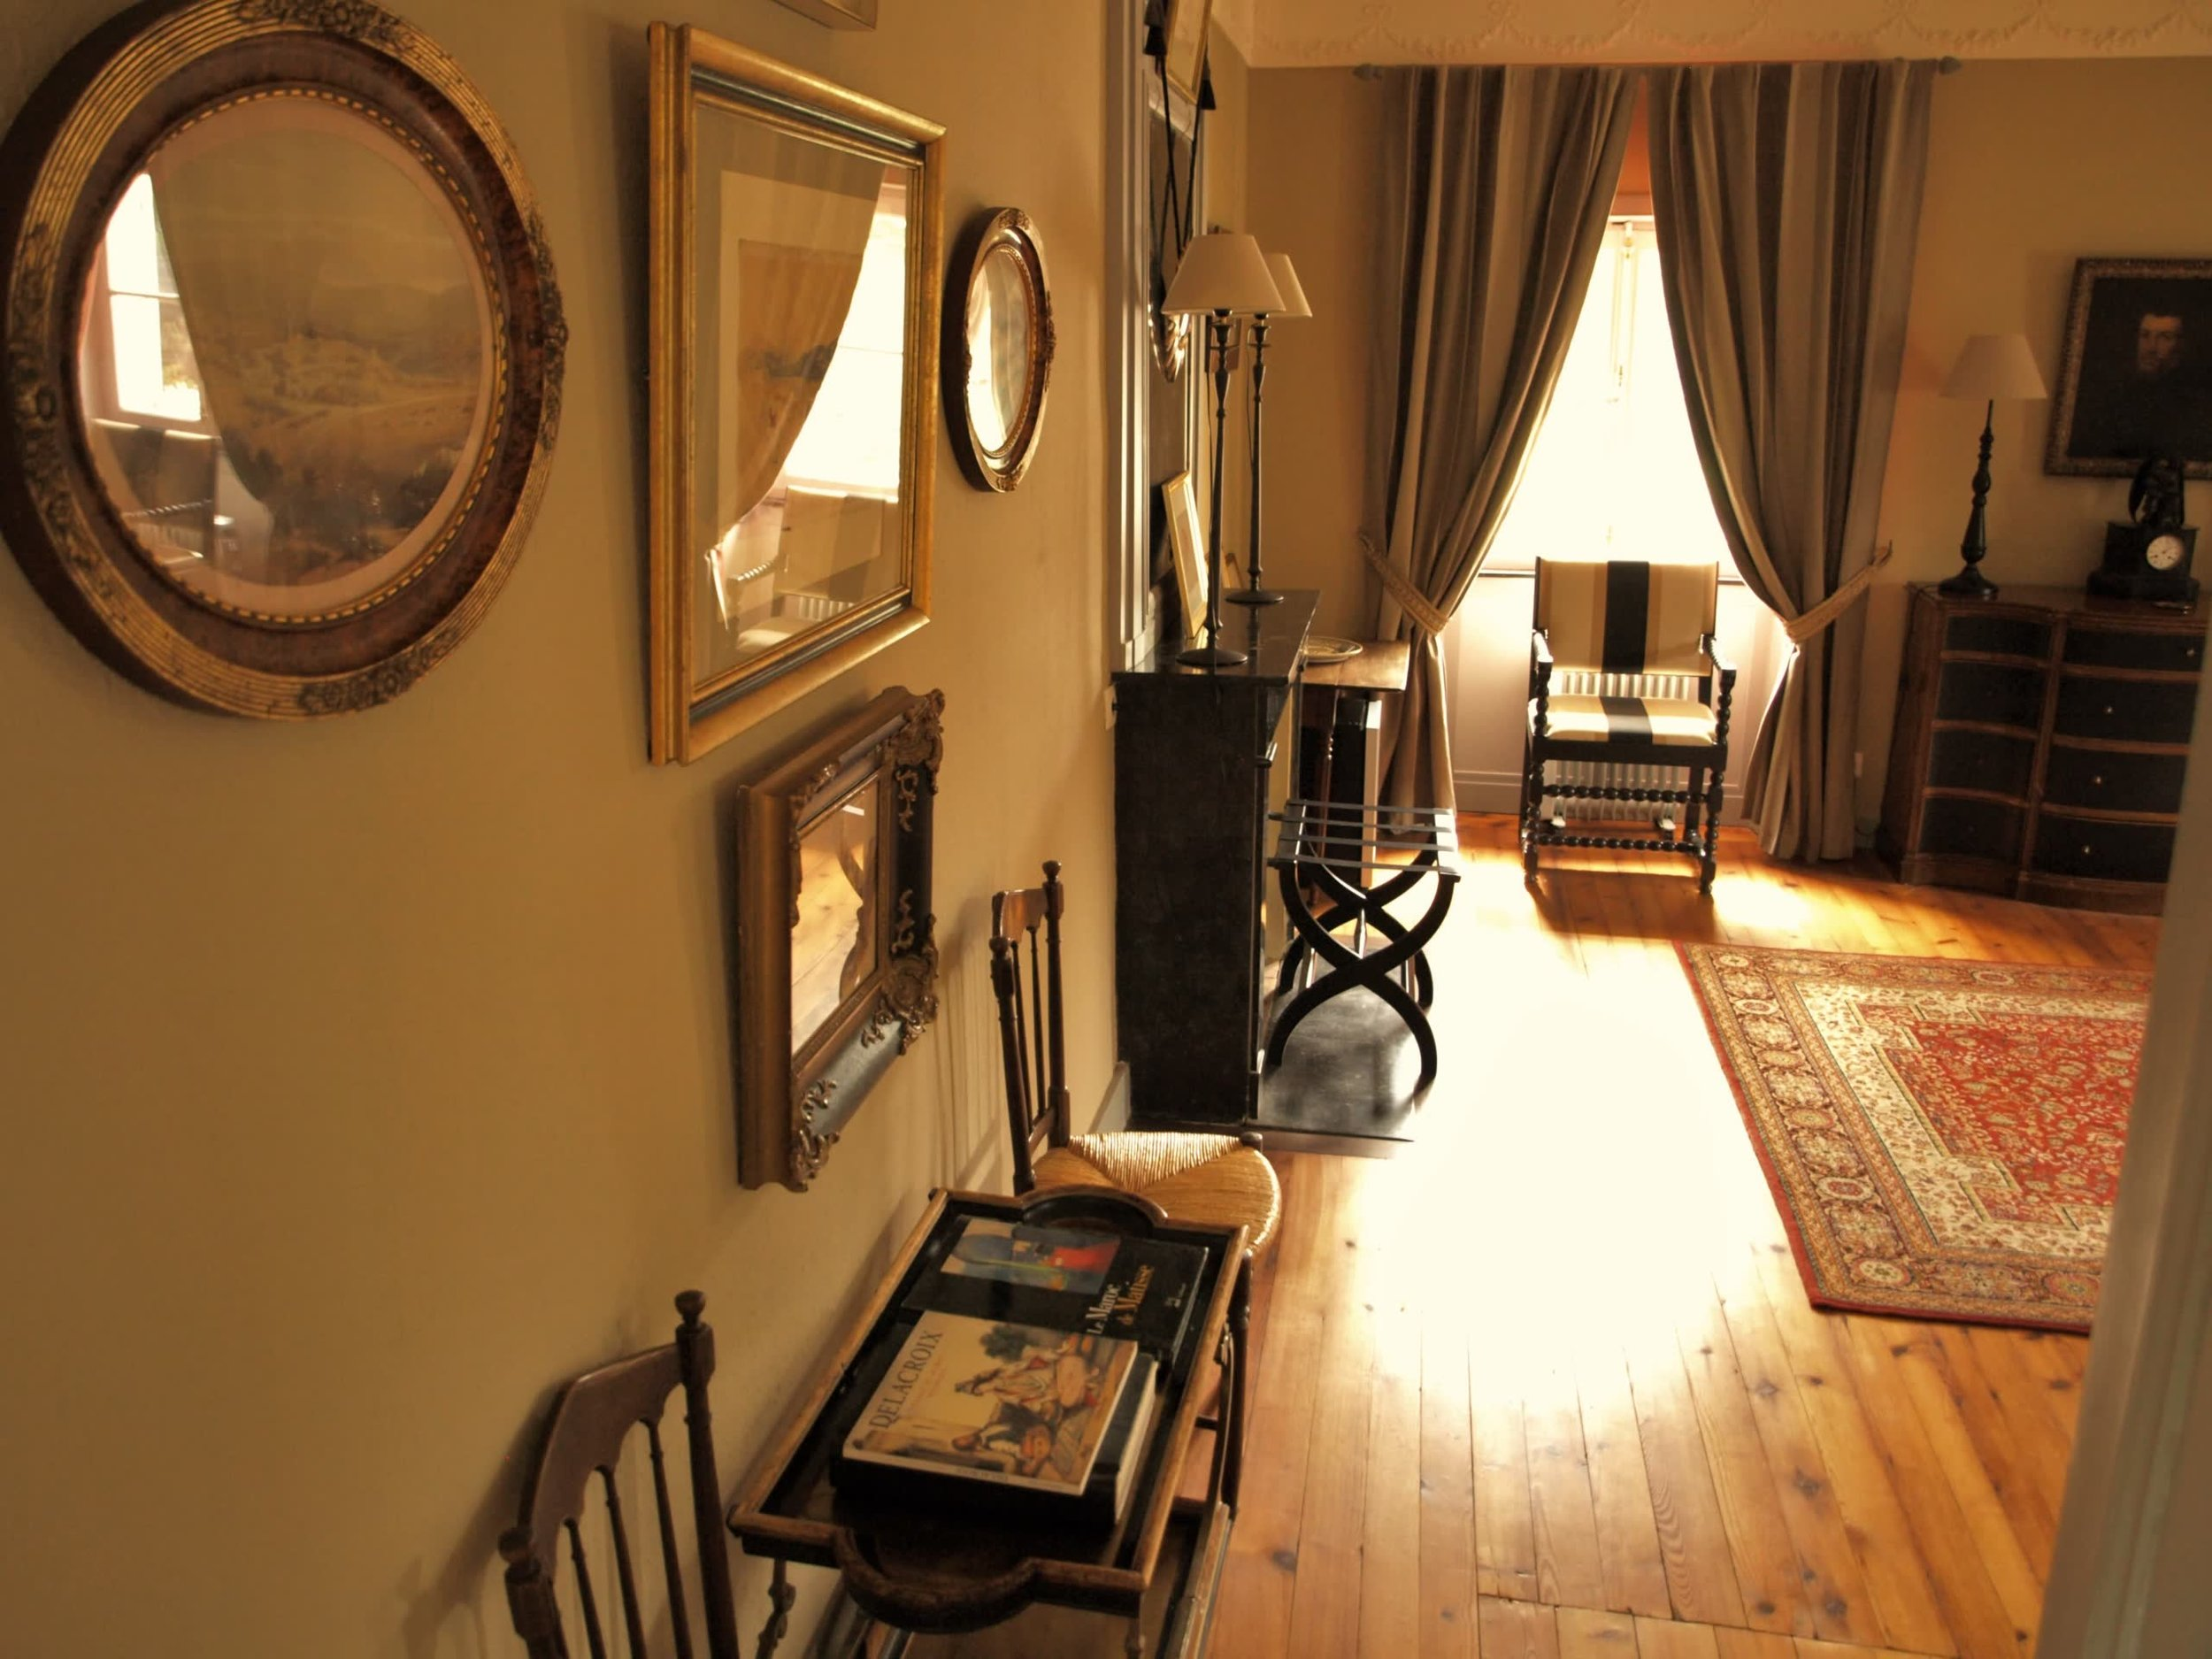 Chateau de la Pommeraye - charming boutique hotel chateau b&b spa normandy calvados bedroom Esquisses 4(2).jpg